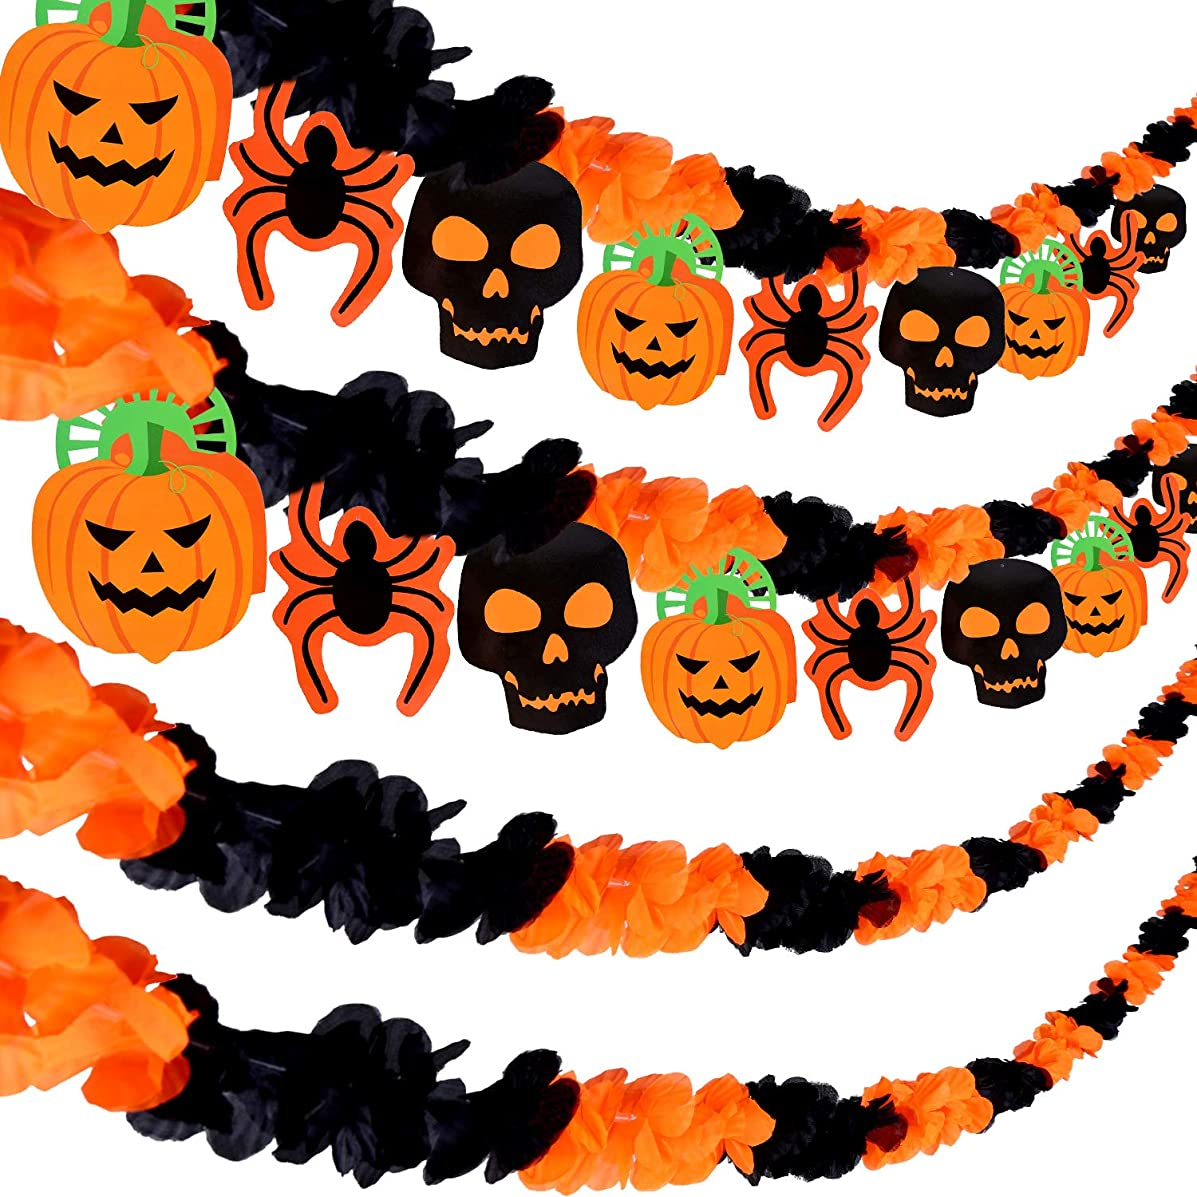 Tatuo 8 Pieces Halloween Banner Halloween Silk Garland with Pumpkin Skull Spider Hanging Banner Flags for Halloween Party Decoration